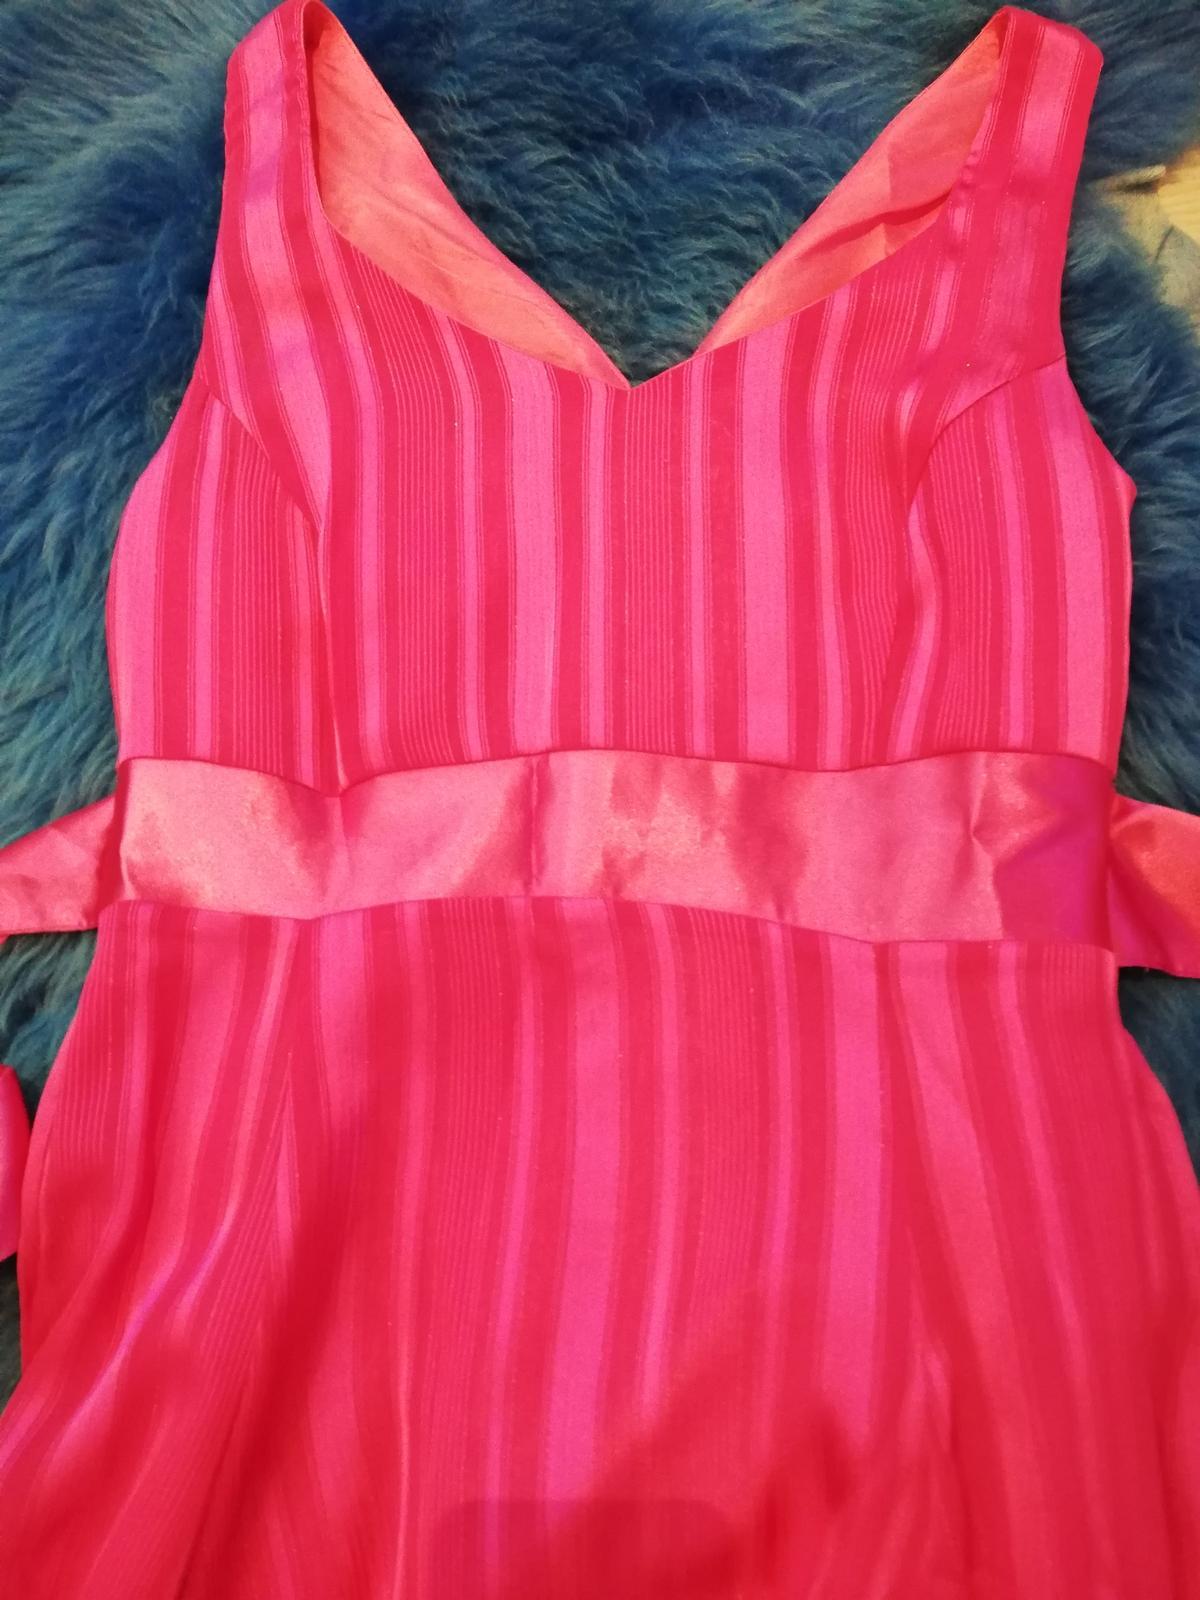 Cyklaménové šaty  - Obrázok č. 4